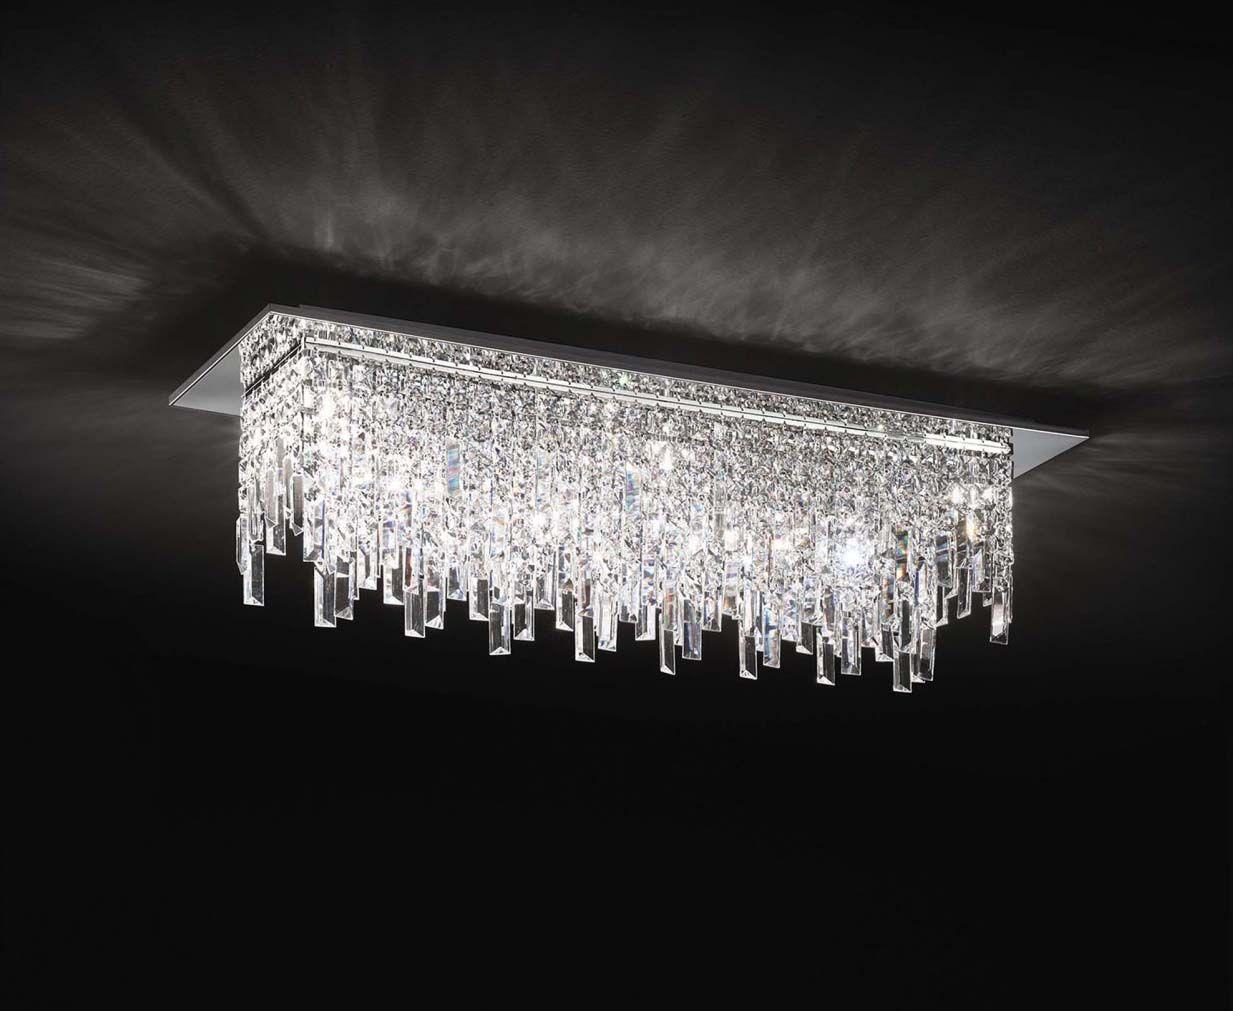 Plafoniera Cristallo Led : Plafoniera moderna luci affra frangia design swarovsky in